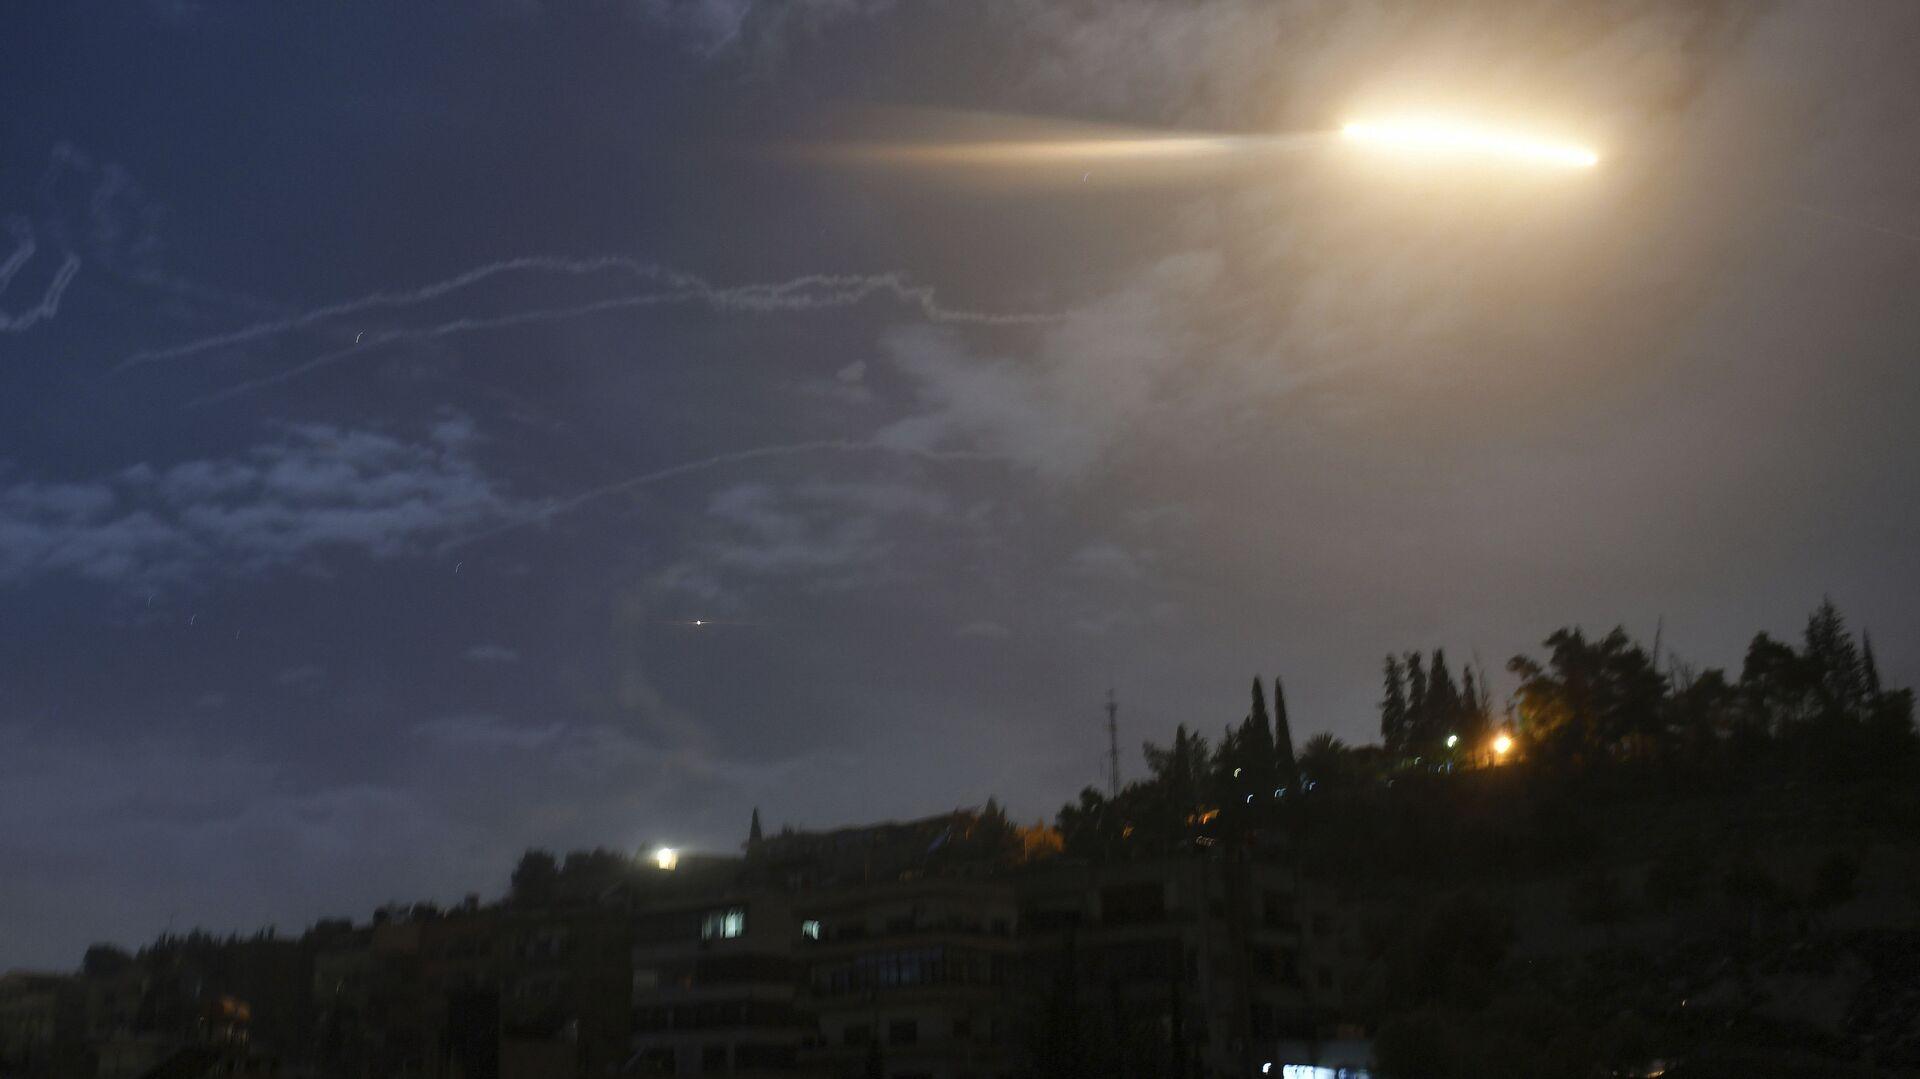 Un misil israelí sobrevuela Siria - Sputnik Mundo, 1920, 22.04.2021